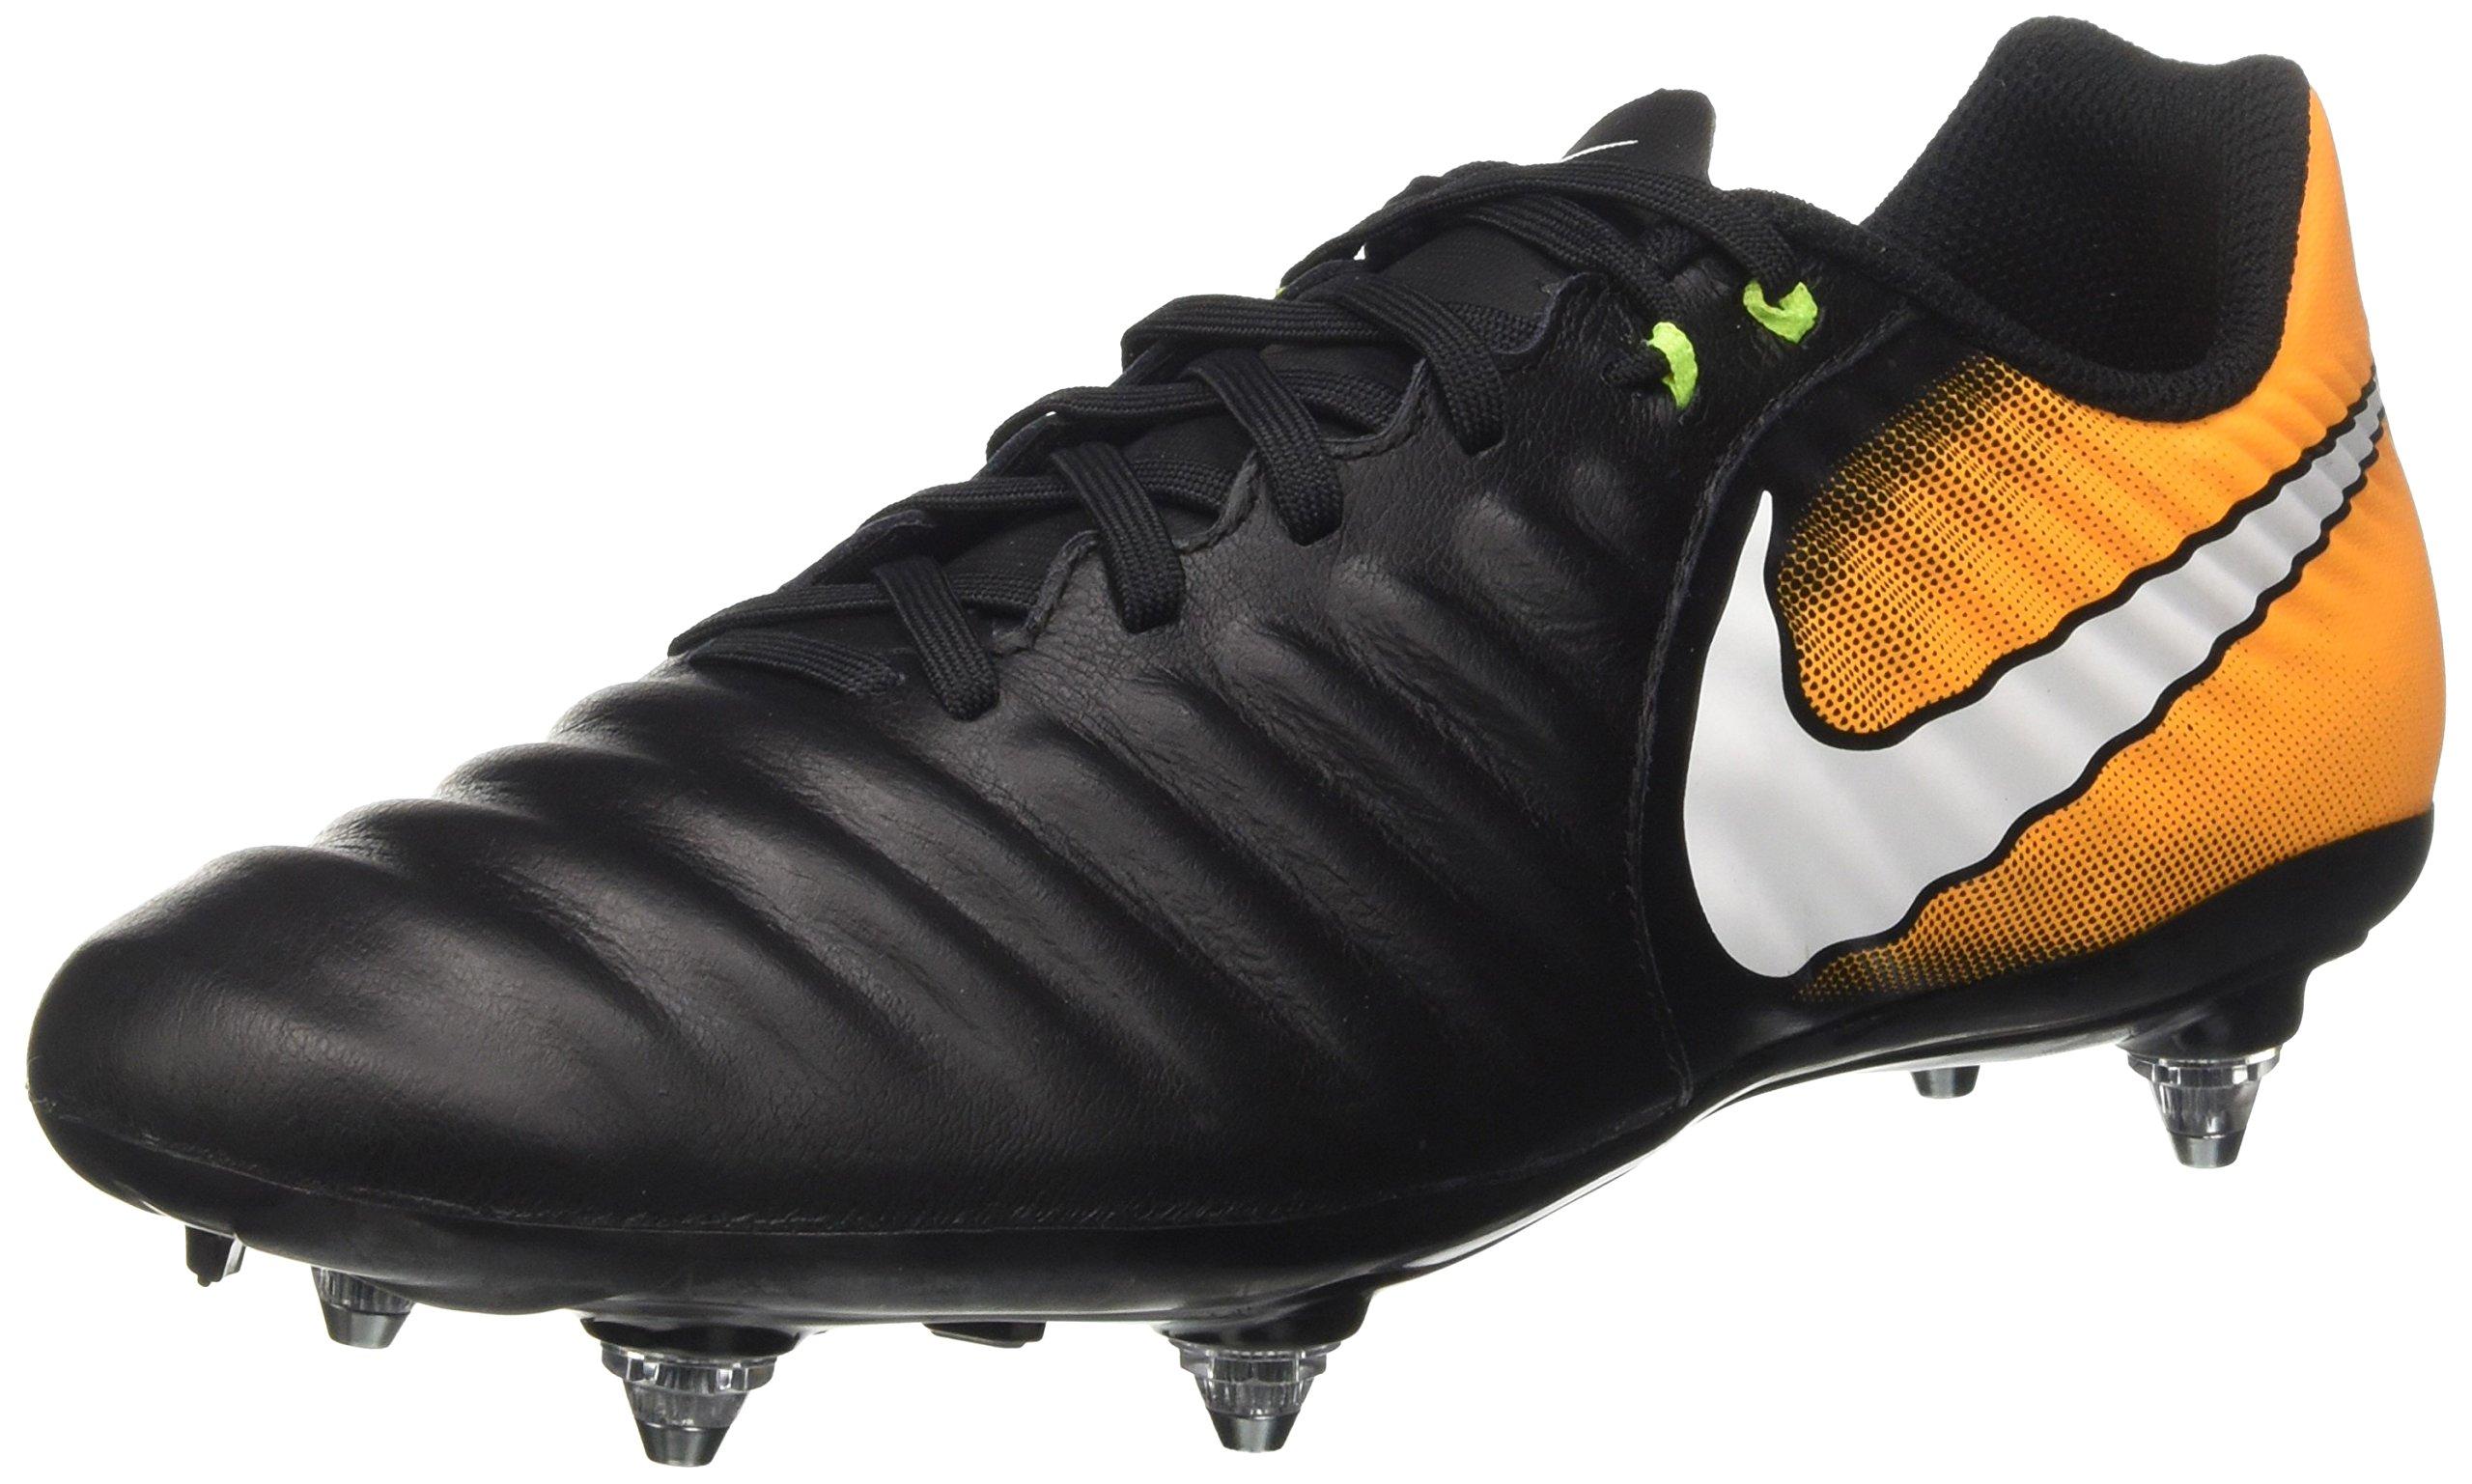 volt42 Eu Orange HommeNoirblack laser De Sg Ligera Chaussures white Football Nike Tiempo Iv Kl1cJF